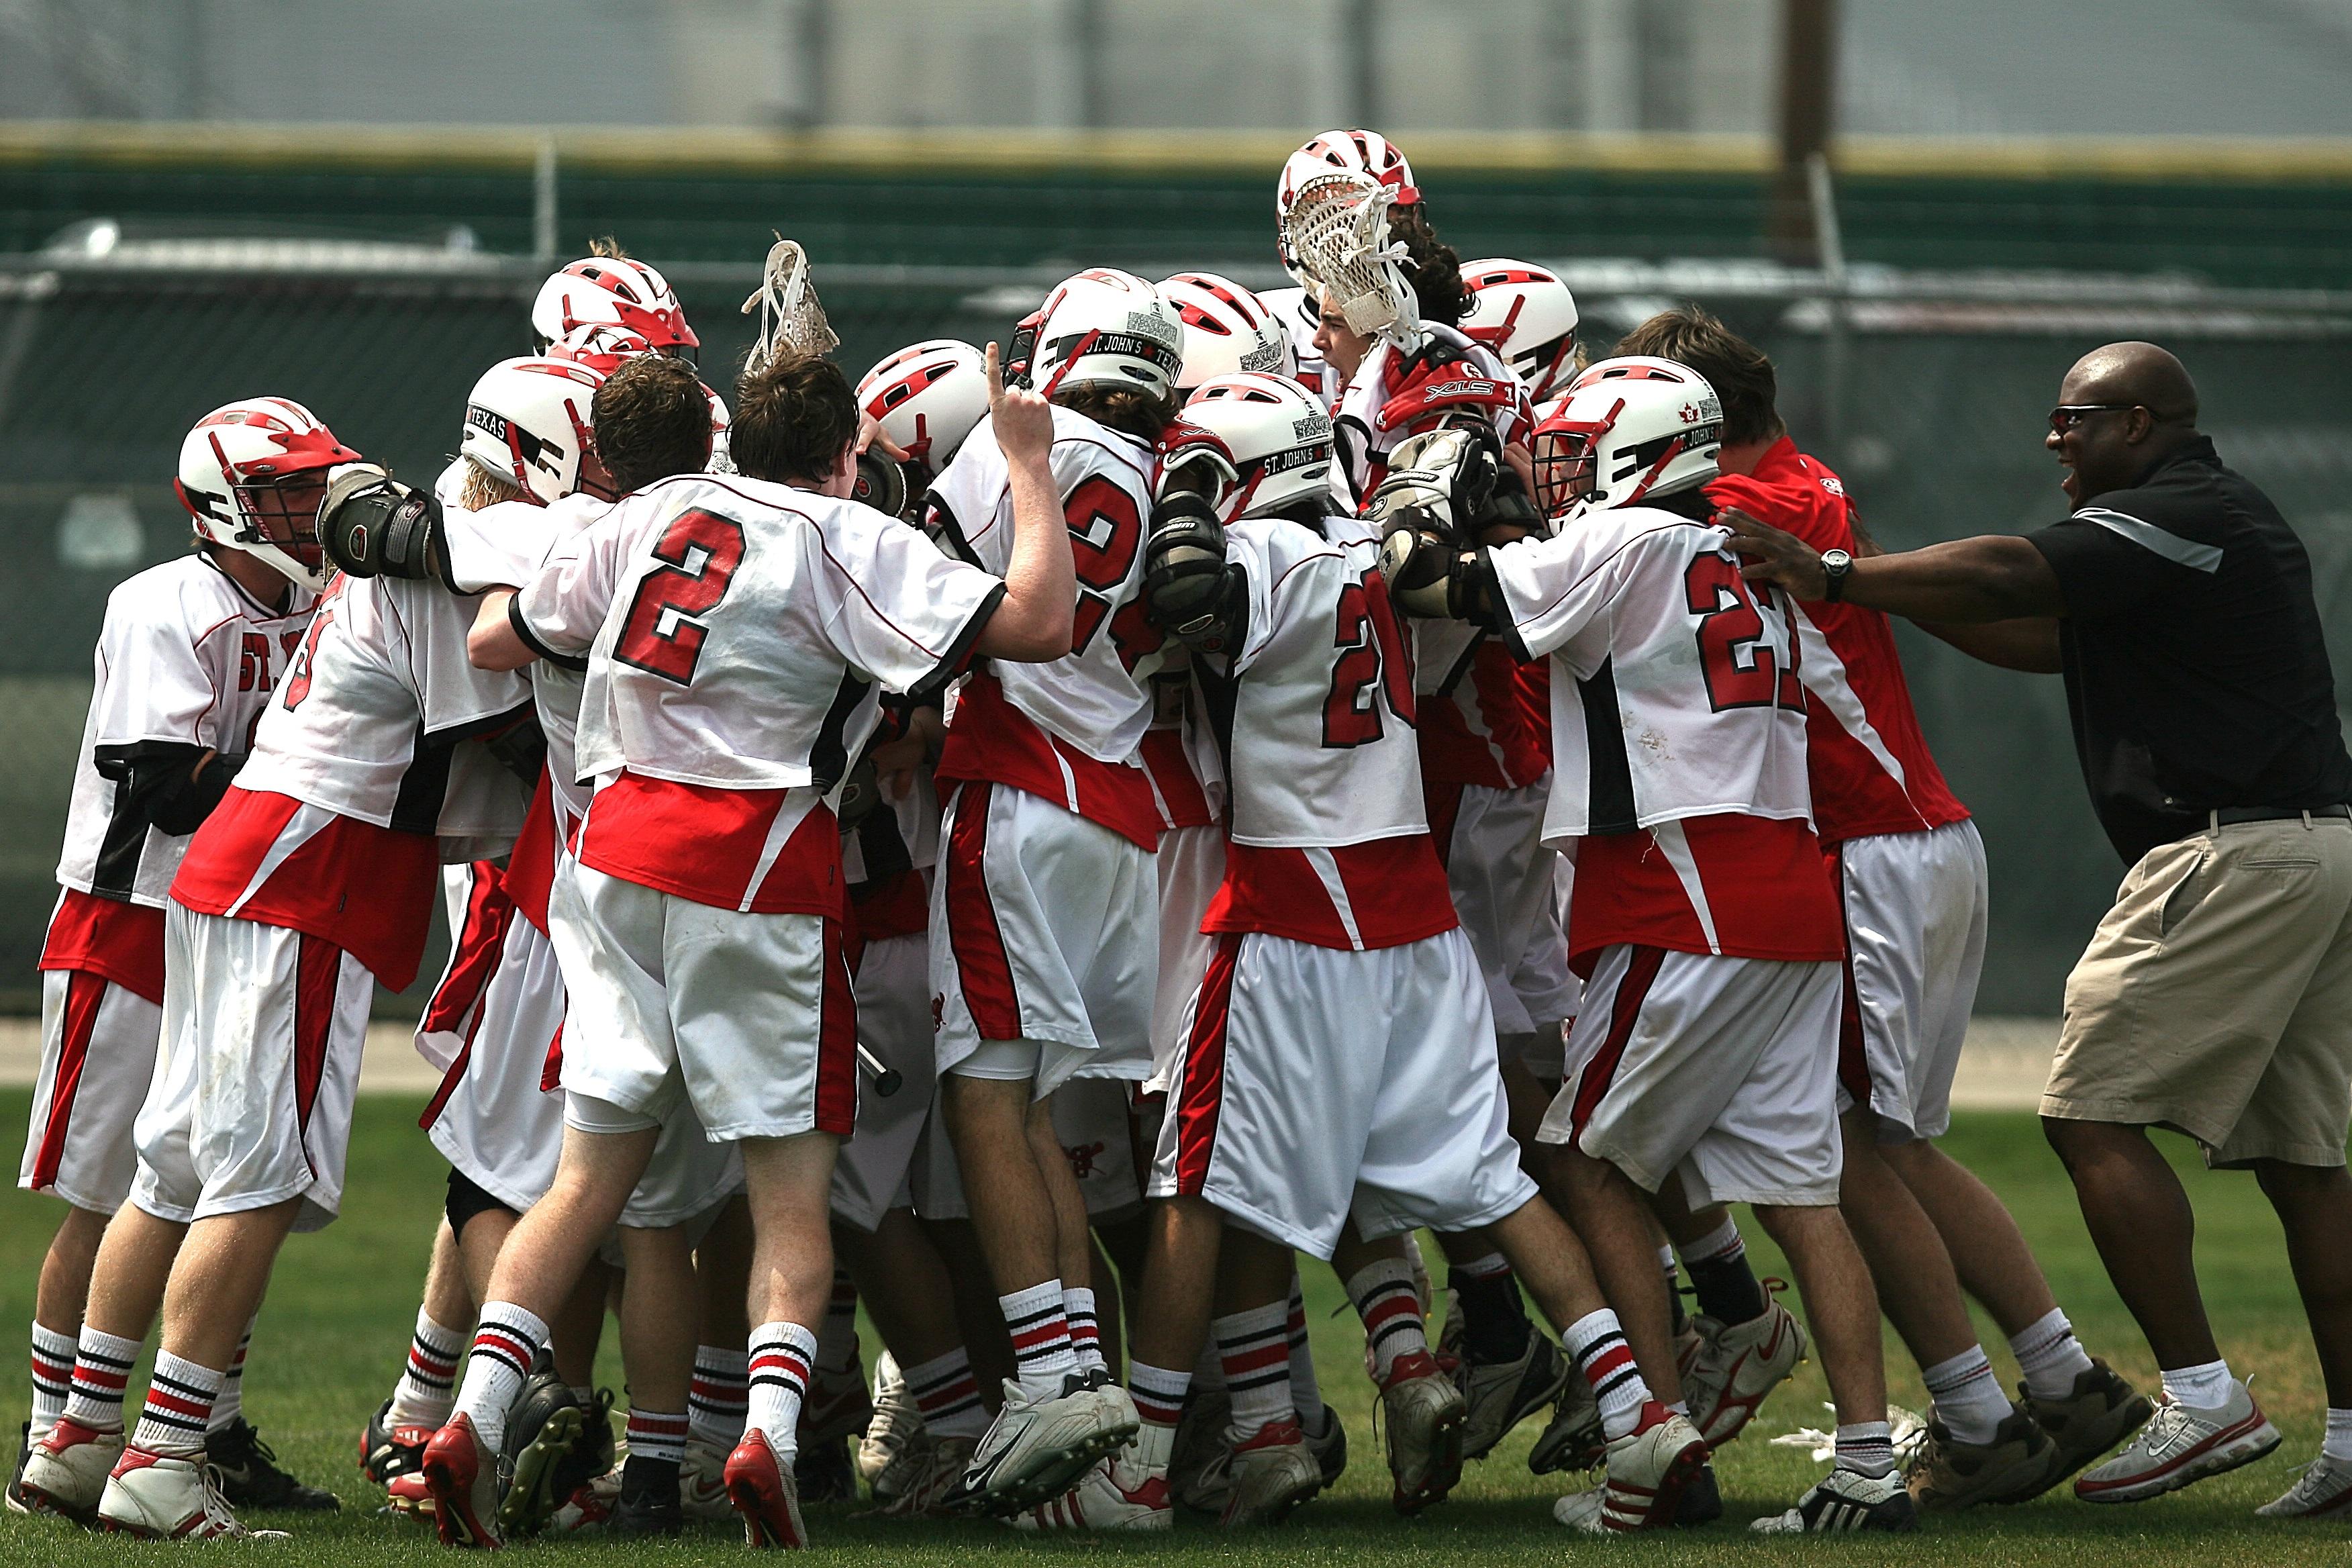 lacrosse-lacrosse-team-champions-state-c